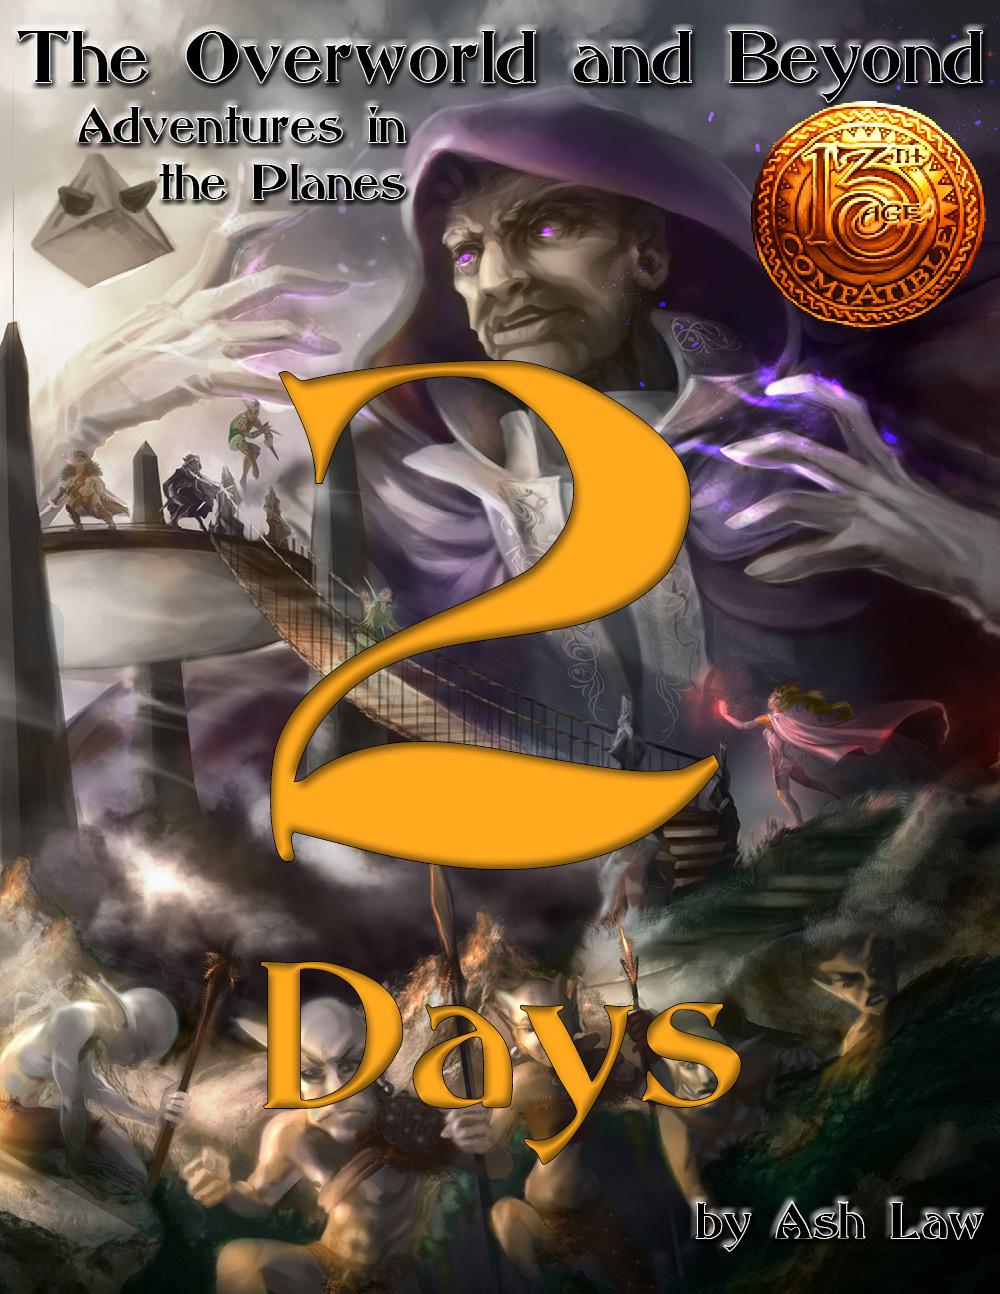 Countdown Cover 2.jpg